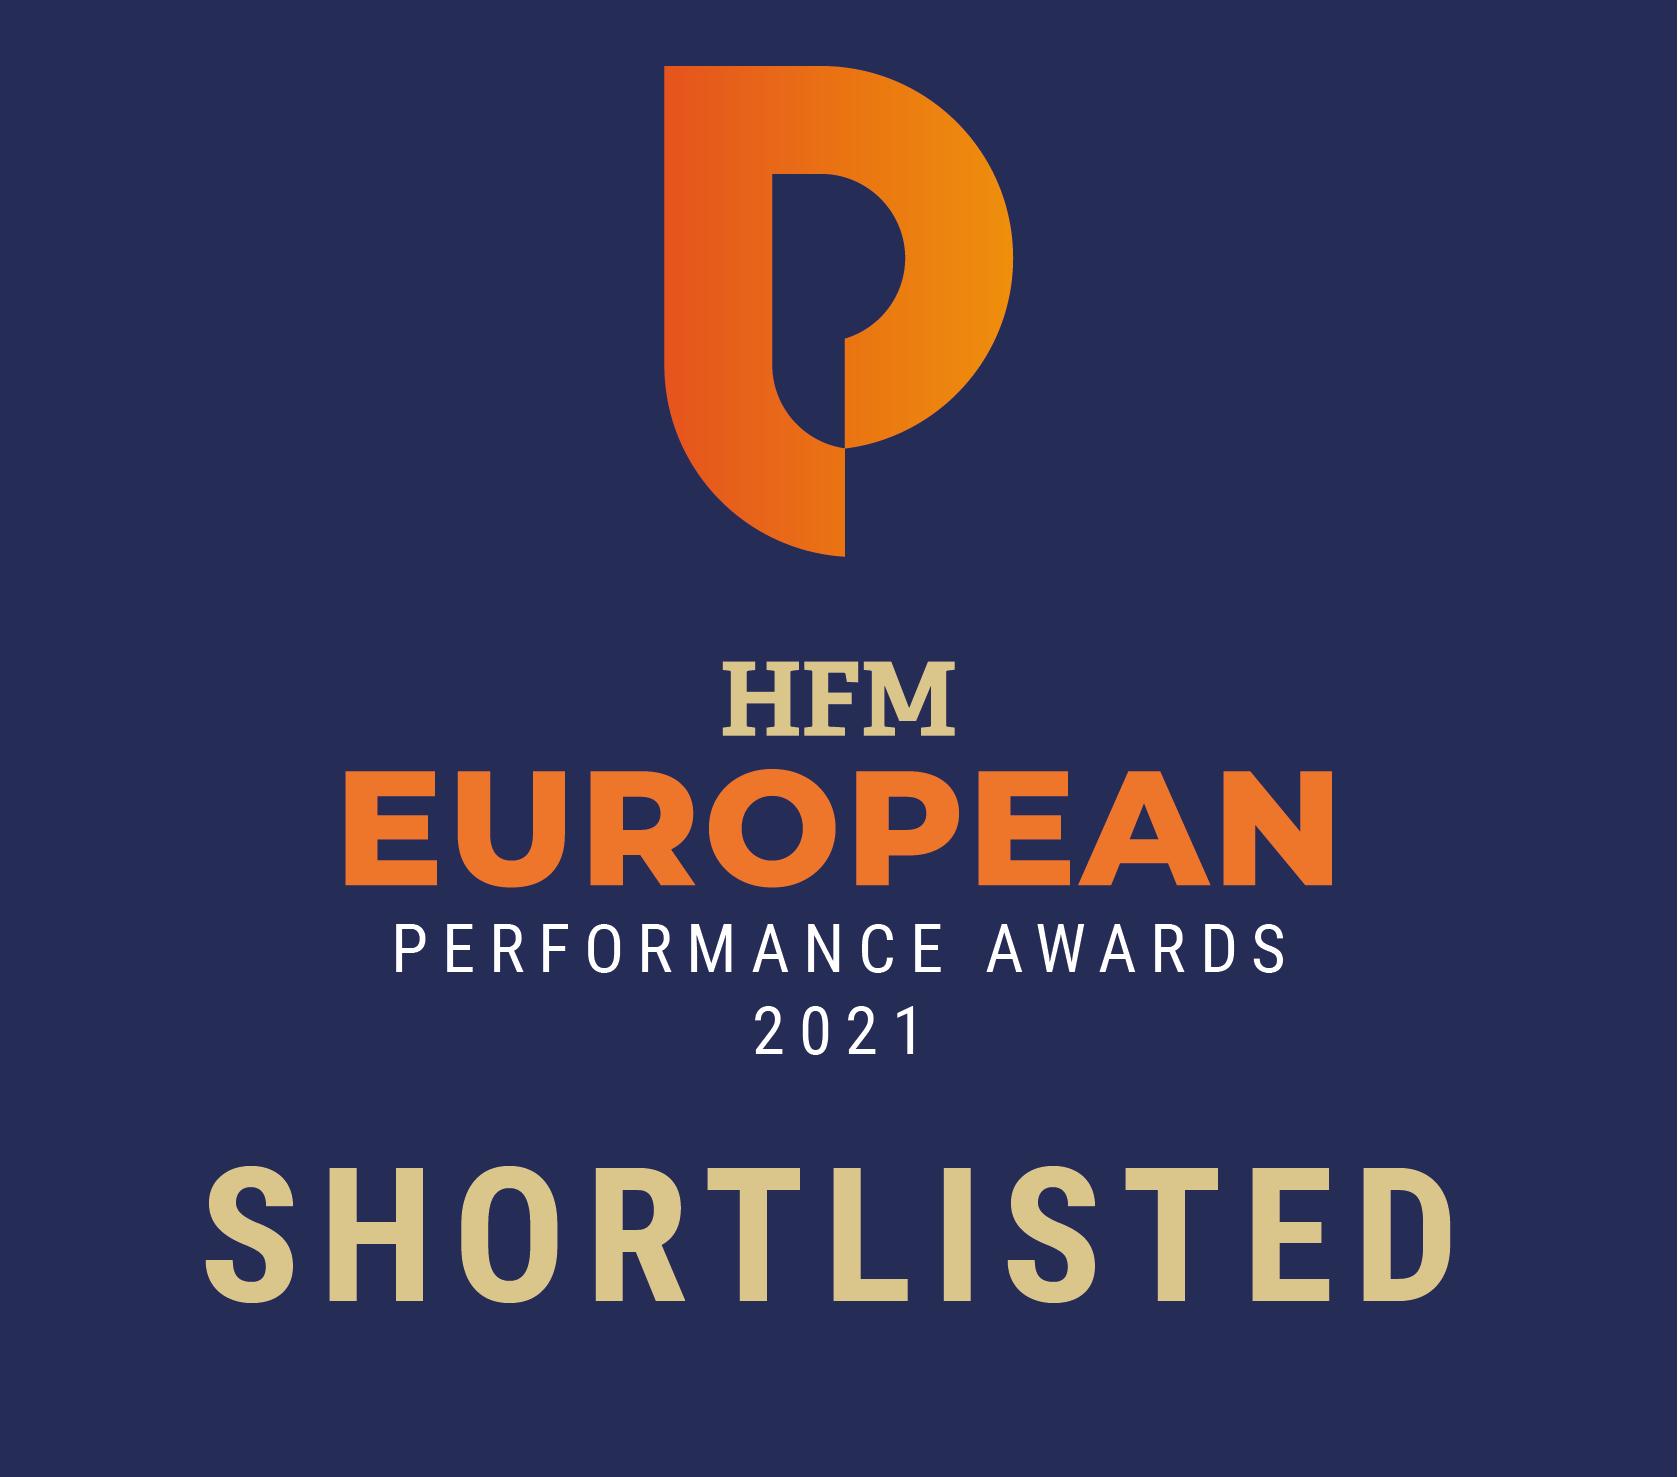 HFM EU Performance Awards Shortlisted Logo